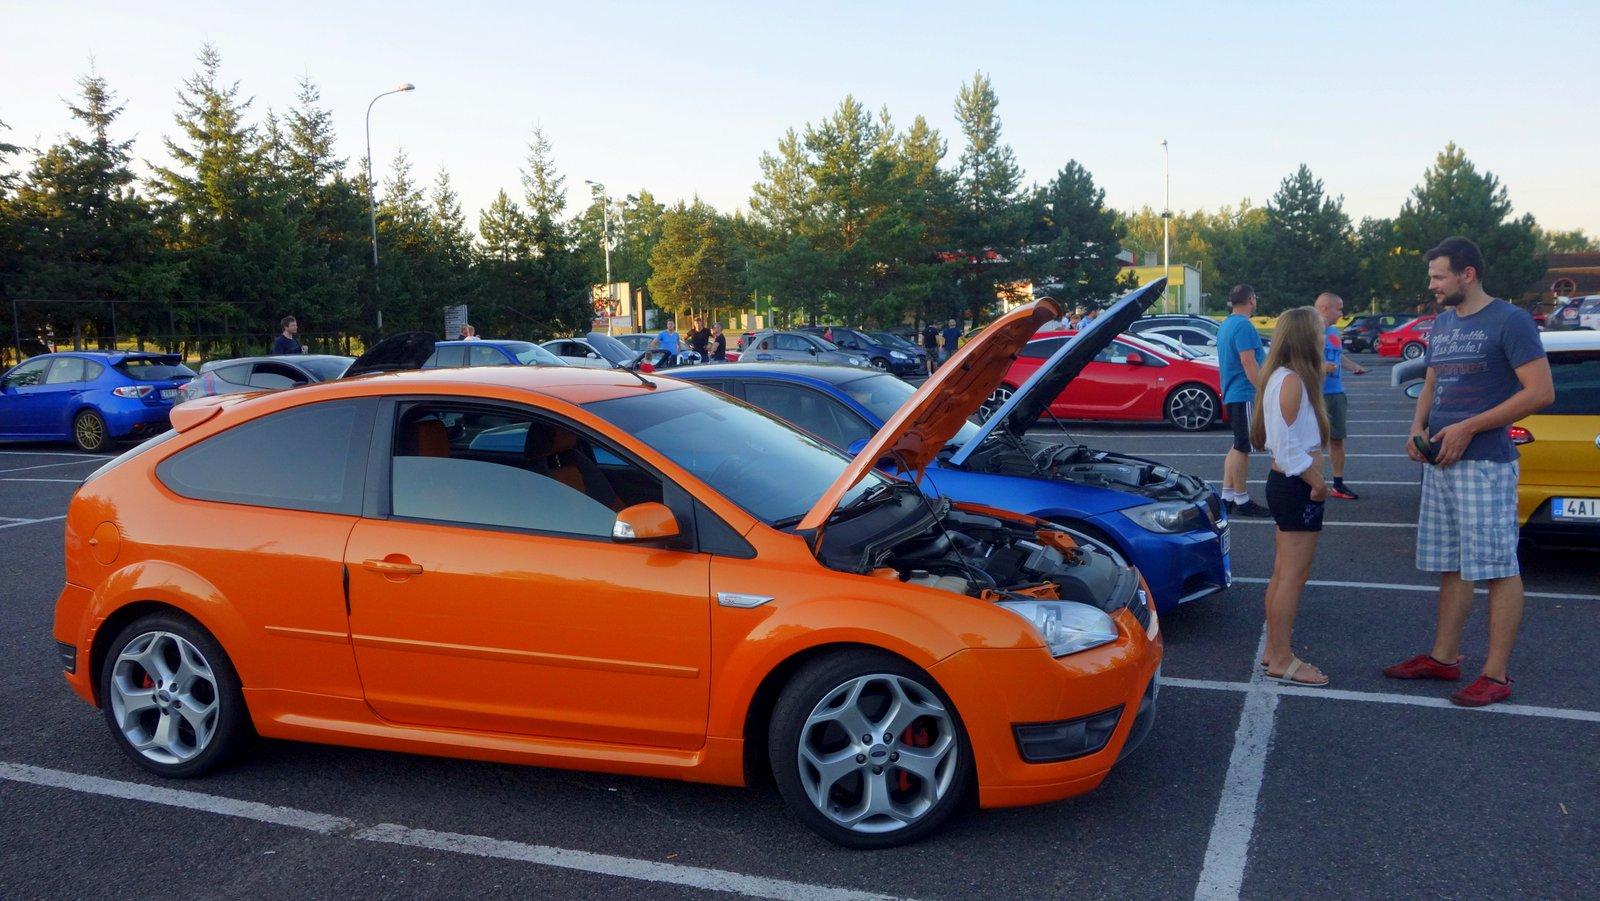 oranžový ford focust ST na parkovišti u okruhu